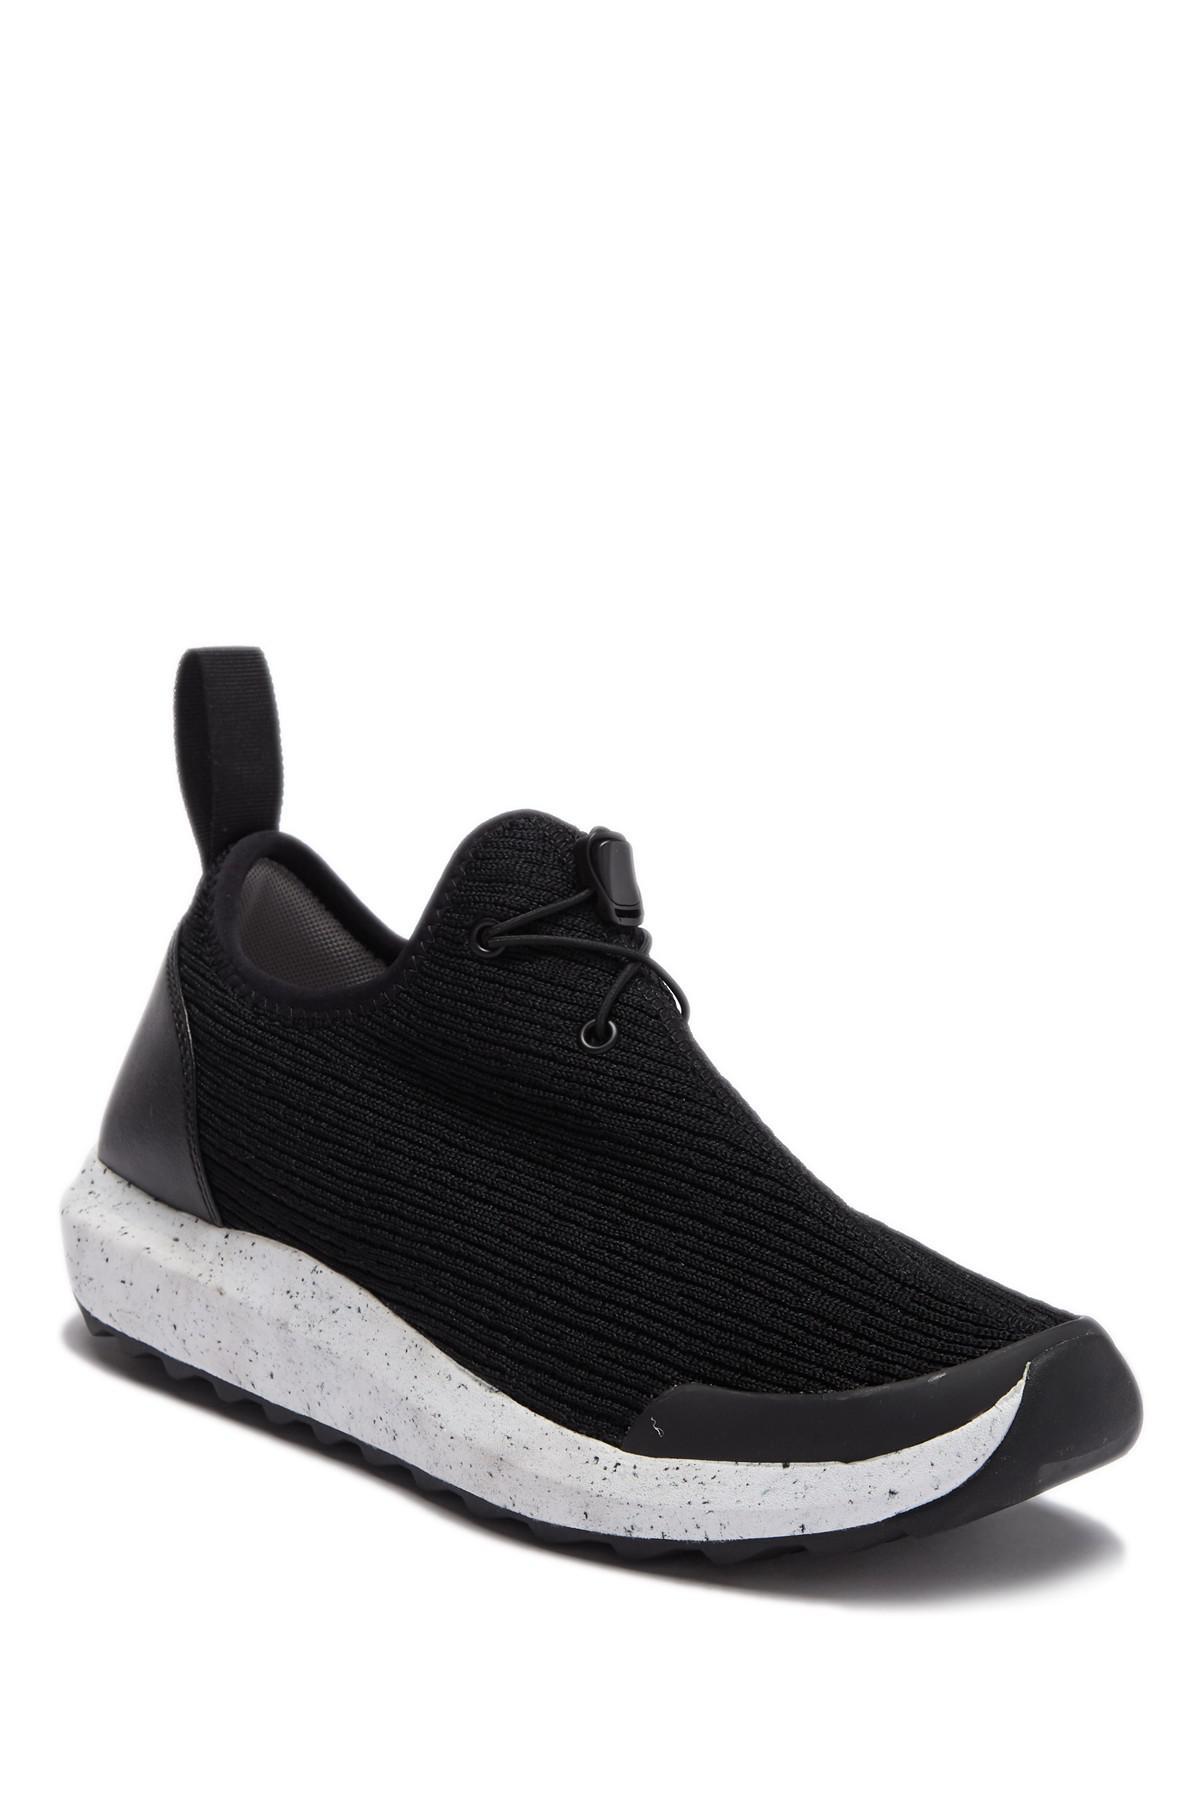 04740bce869 Freewaters. Men s Black Freeland Knit Sneaker.  90  50 From Nordstrom Rack